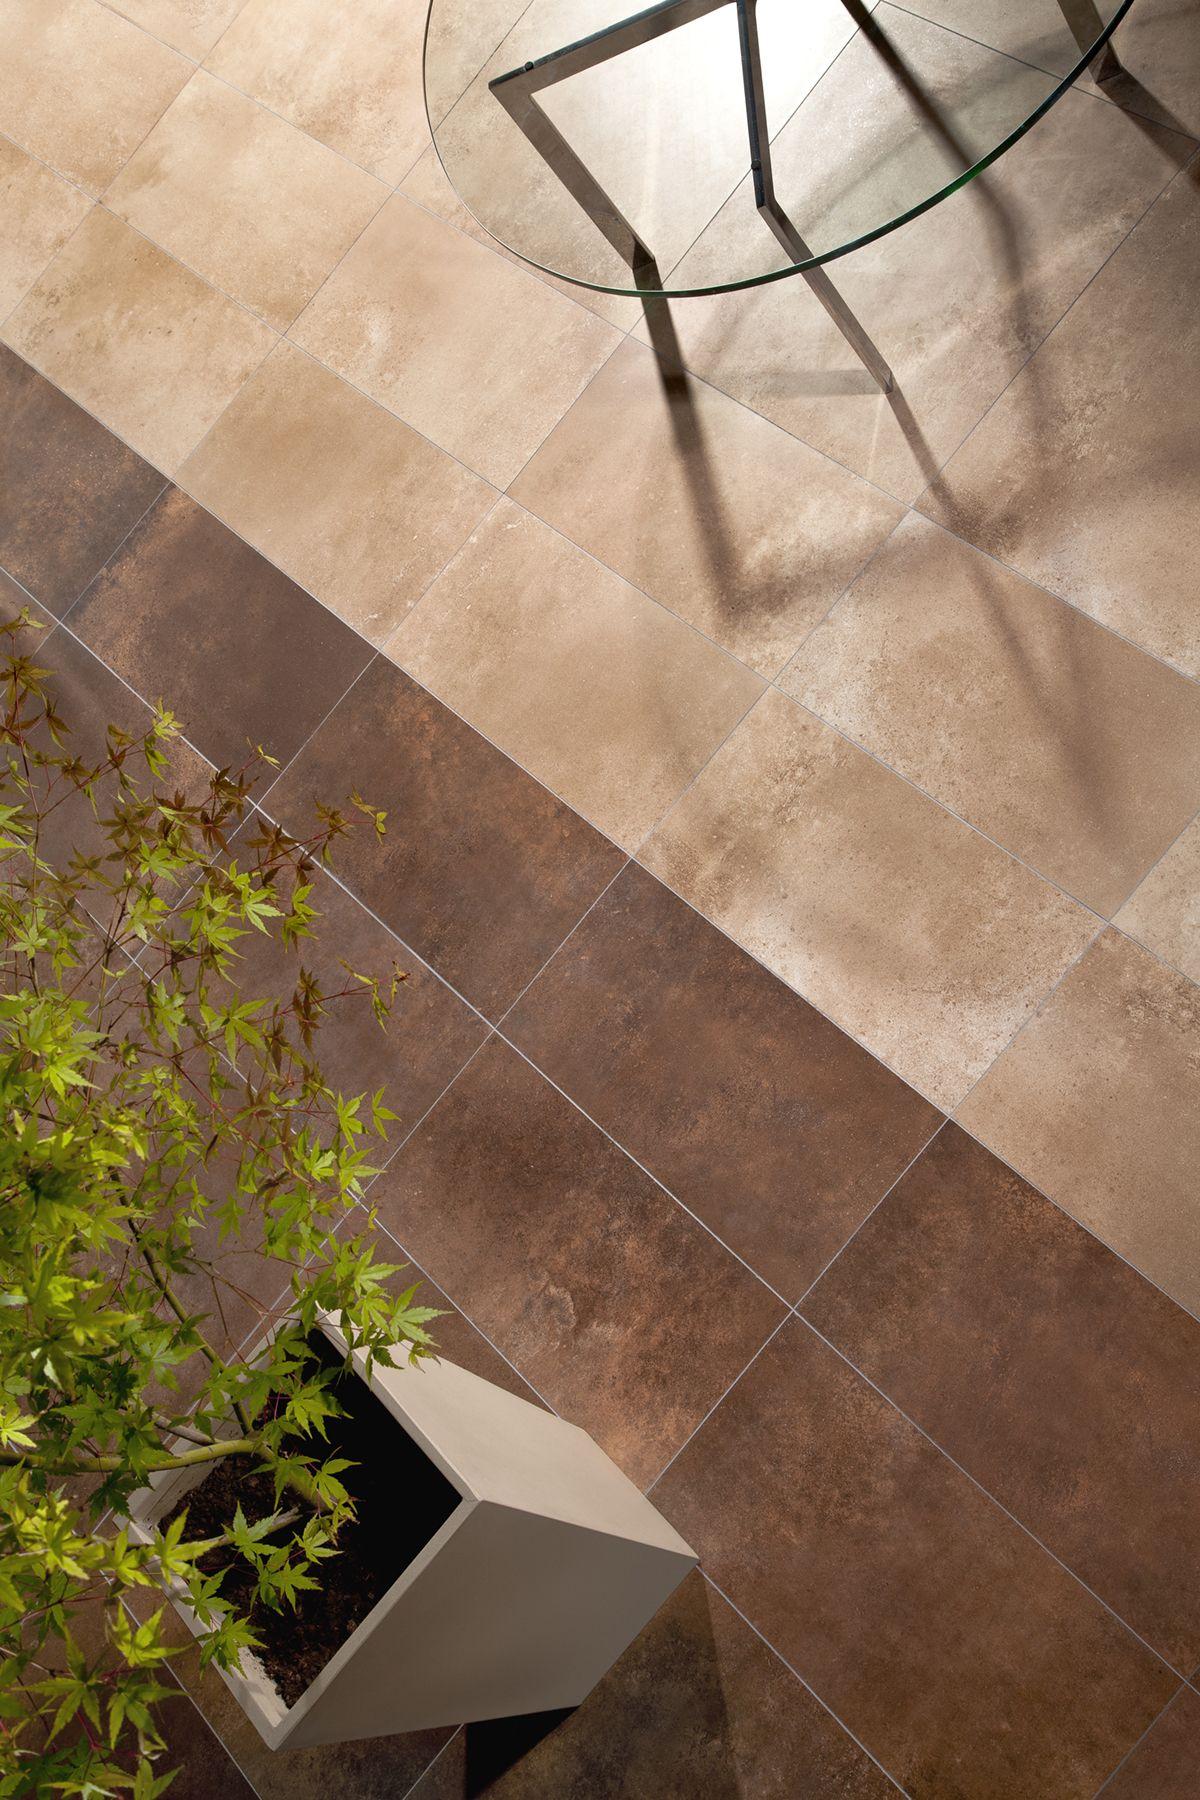 Bauhaus brown y bauhaus sand cermicos san lorenzo pisos bauhaus brown y bauhaus sand cermicos san lorenzo dailygadgetfo Choice Image